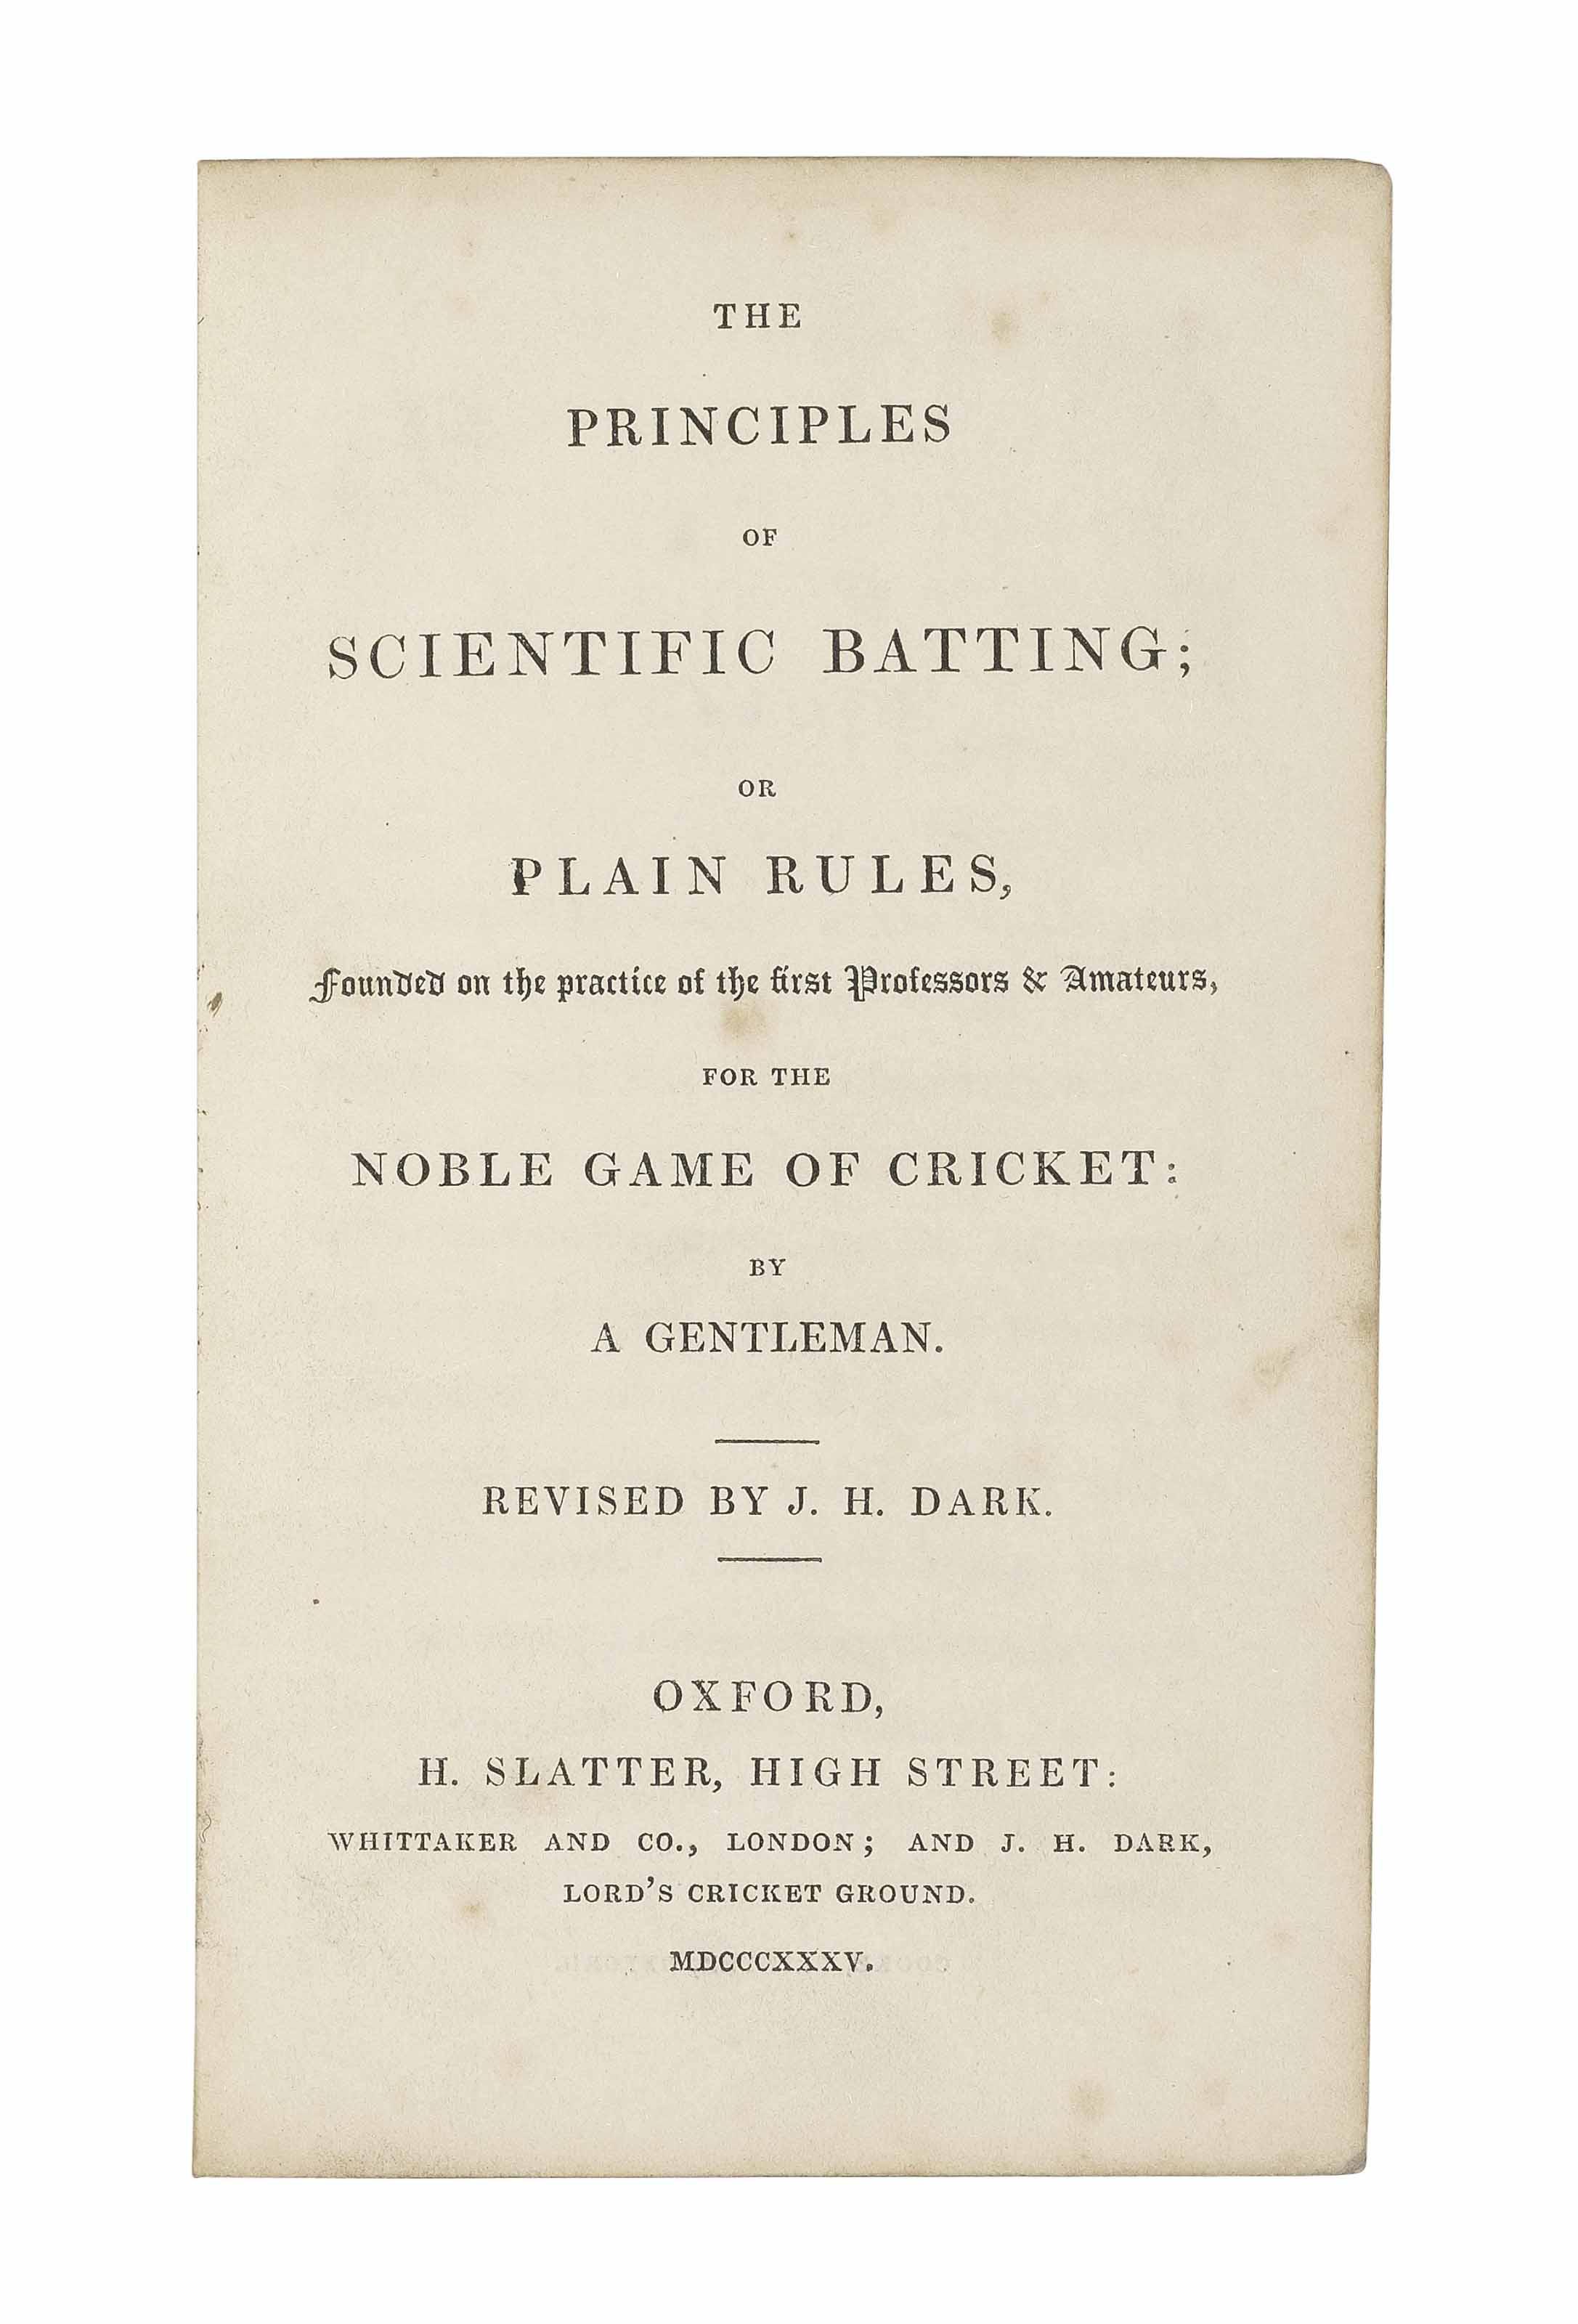 PYCROFT, James (1813-1895). Th